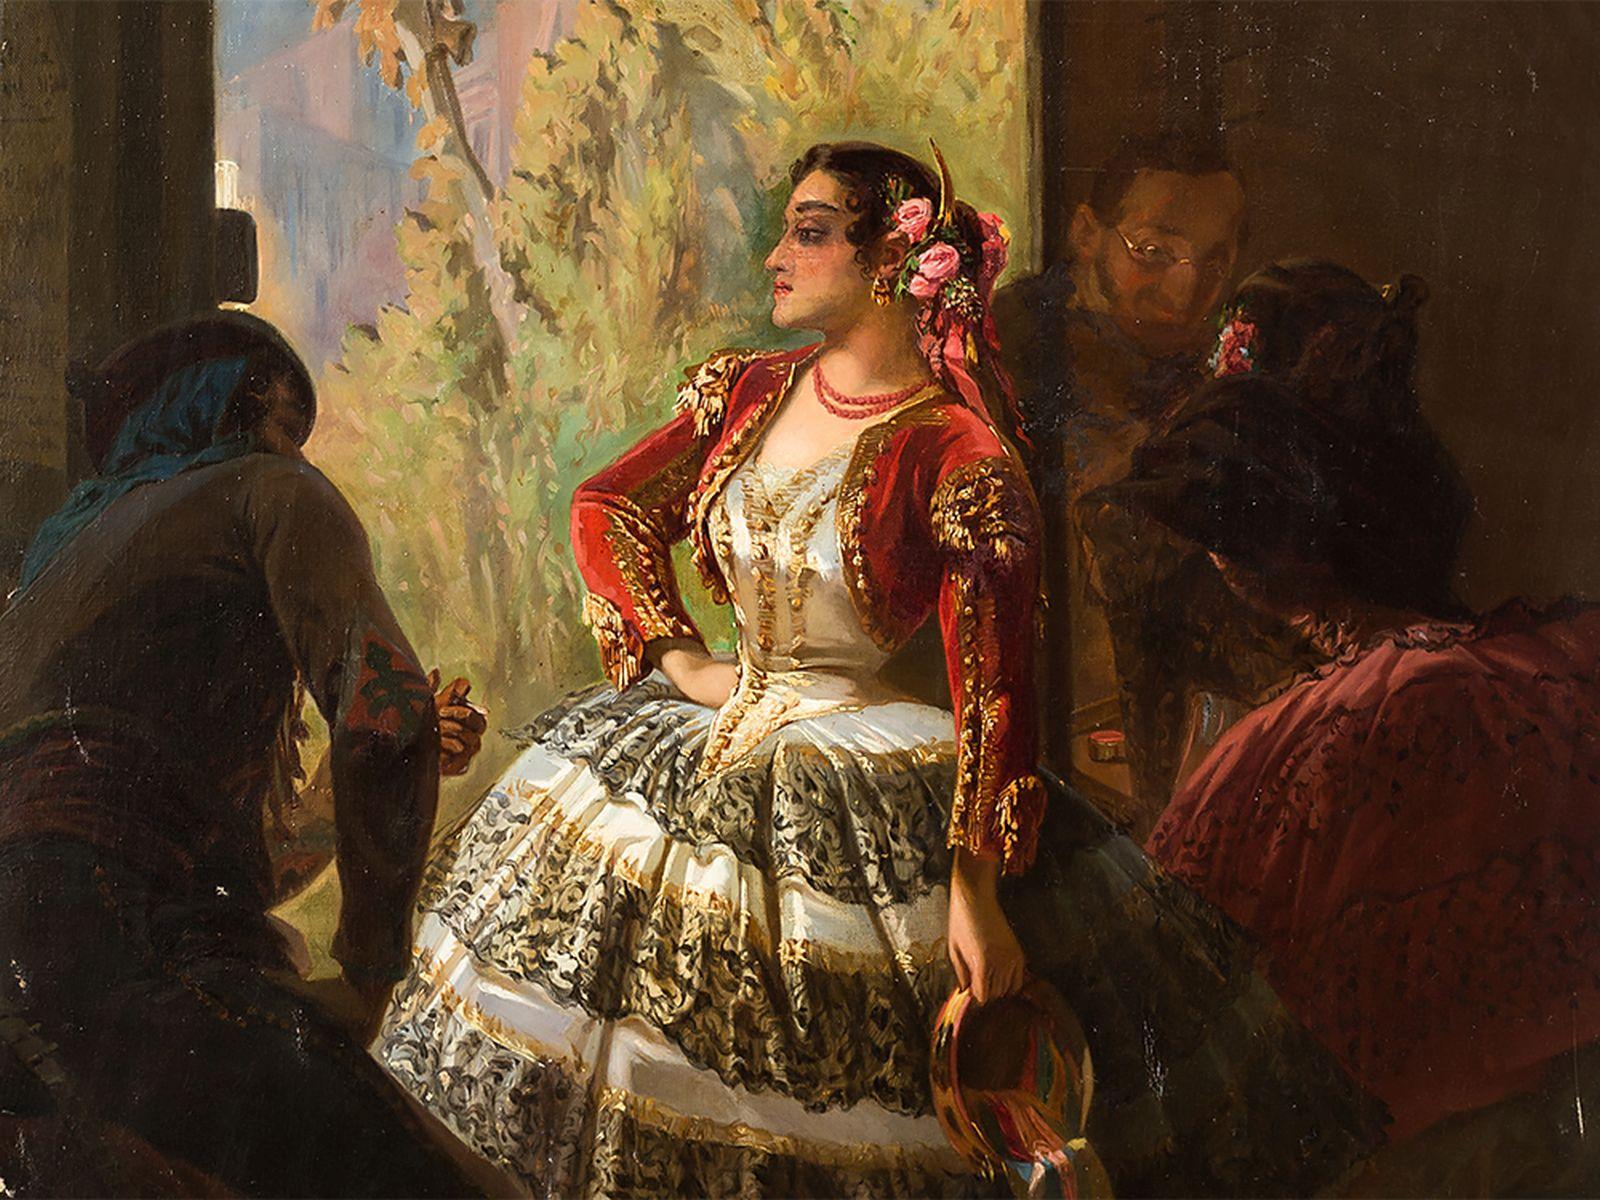 "#15 Eugène Giraud (1806-1881), Spanish Dancer, Oil, 1886 |Eugène Giraud (1806-1881), ""Spanische Tänzerin"" 1886 Image"